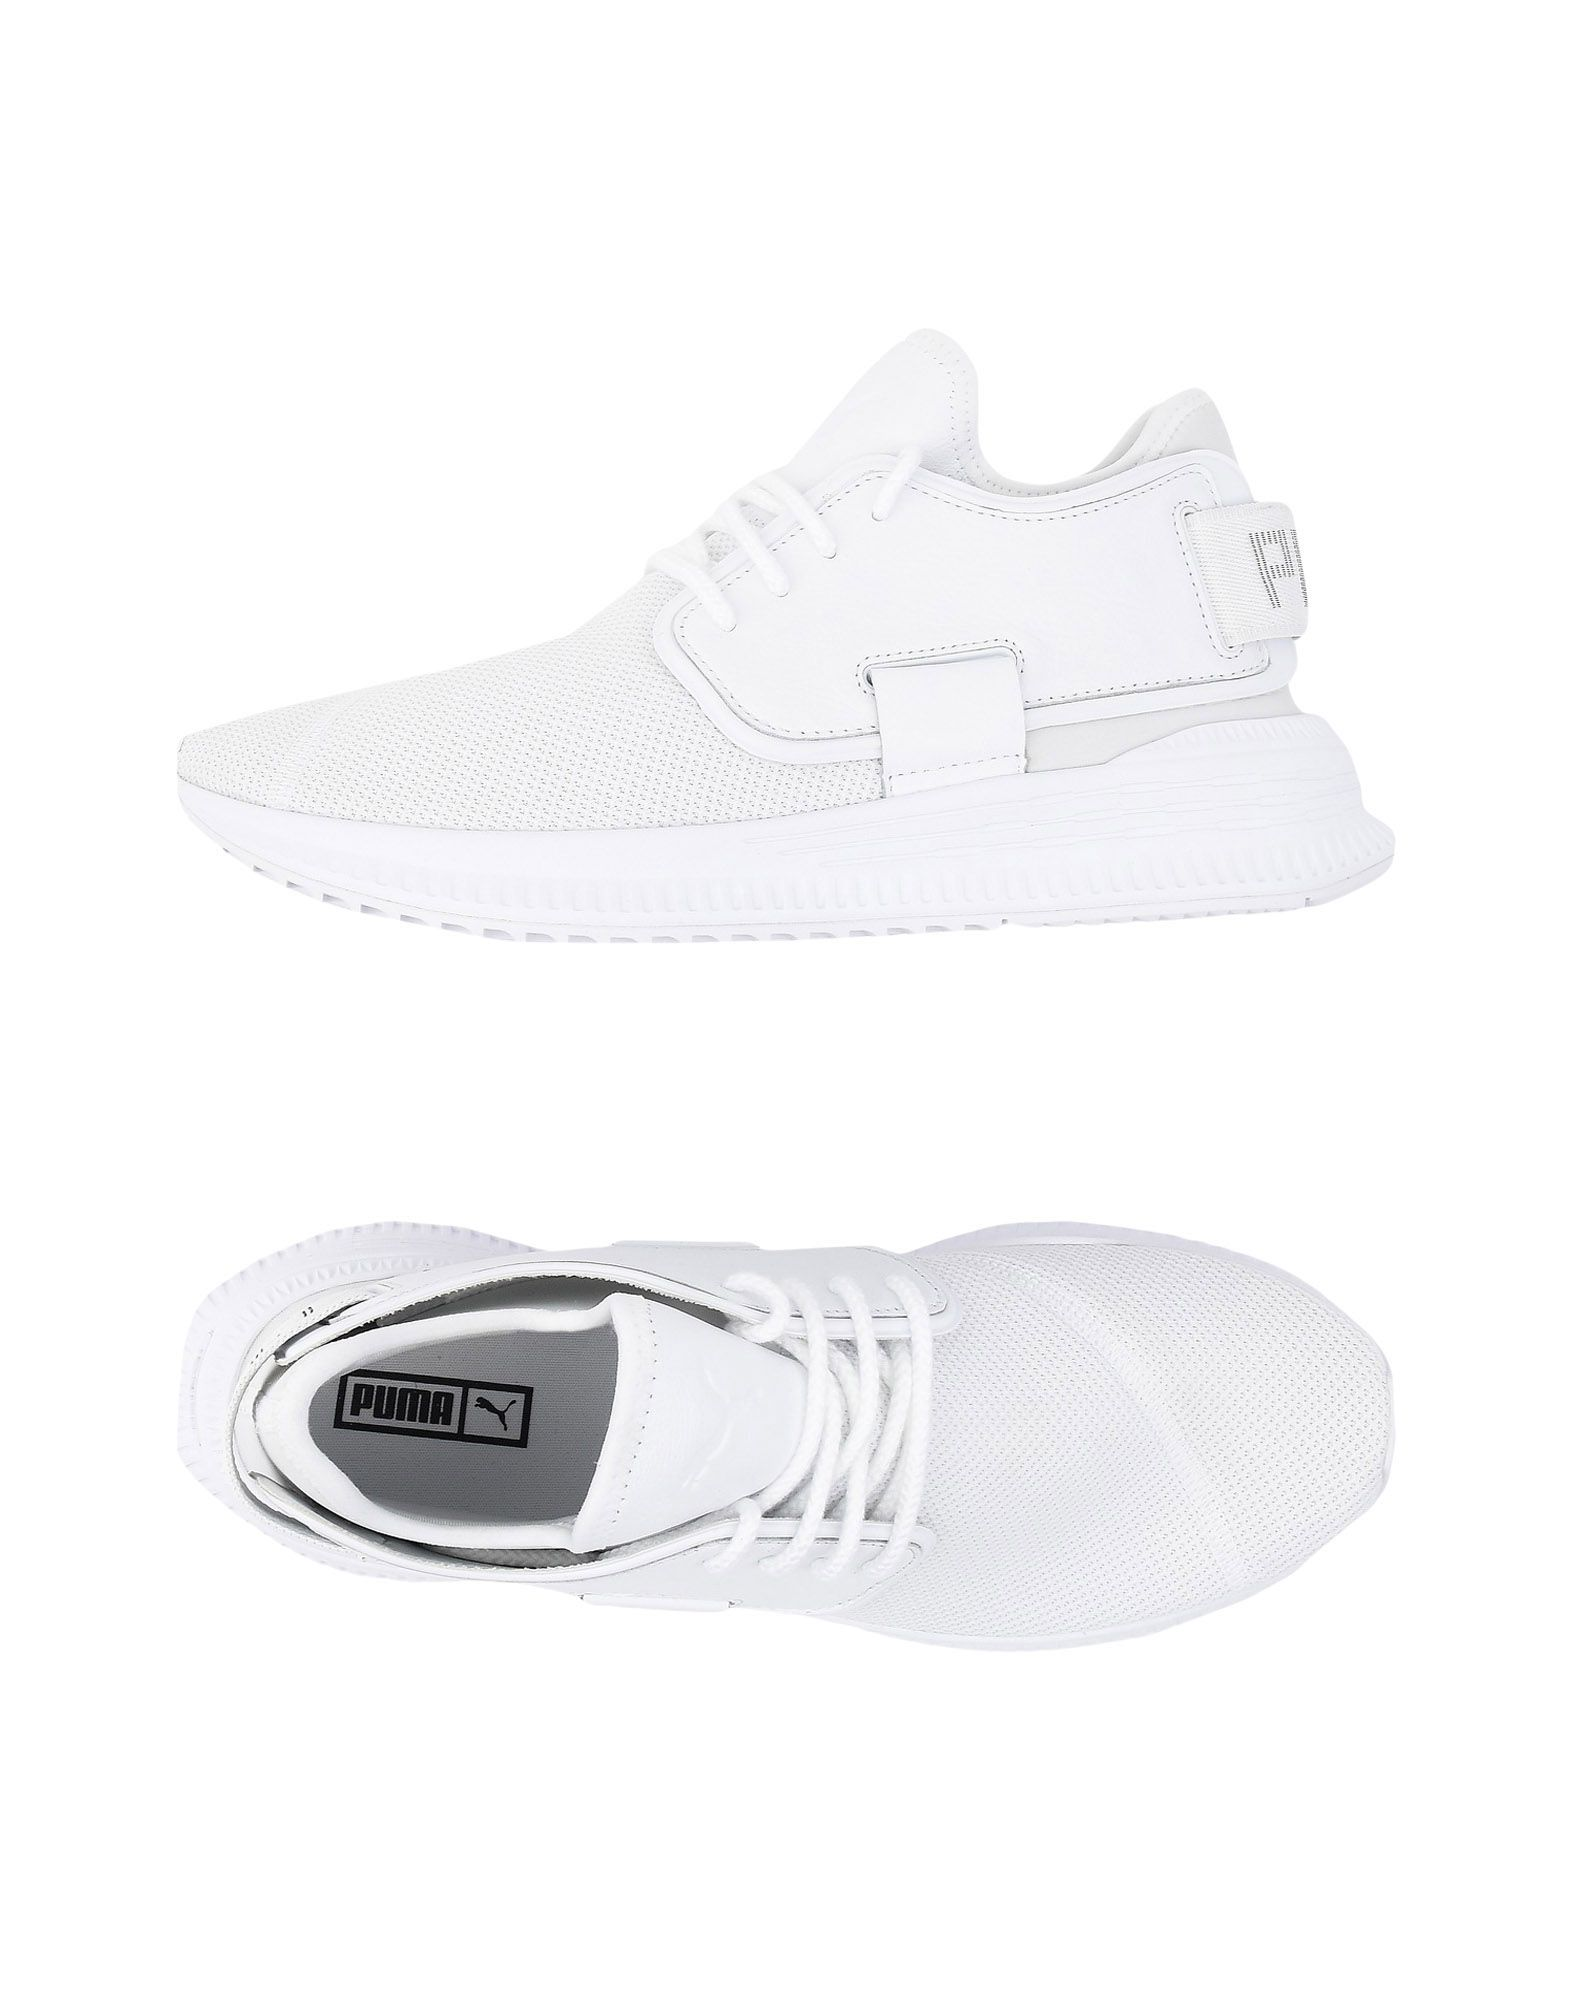 Puma Tsugi 11492613QU Gute Qualität beliebte Schuhe